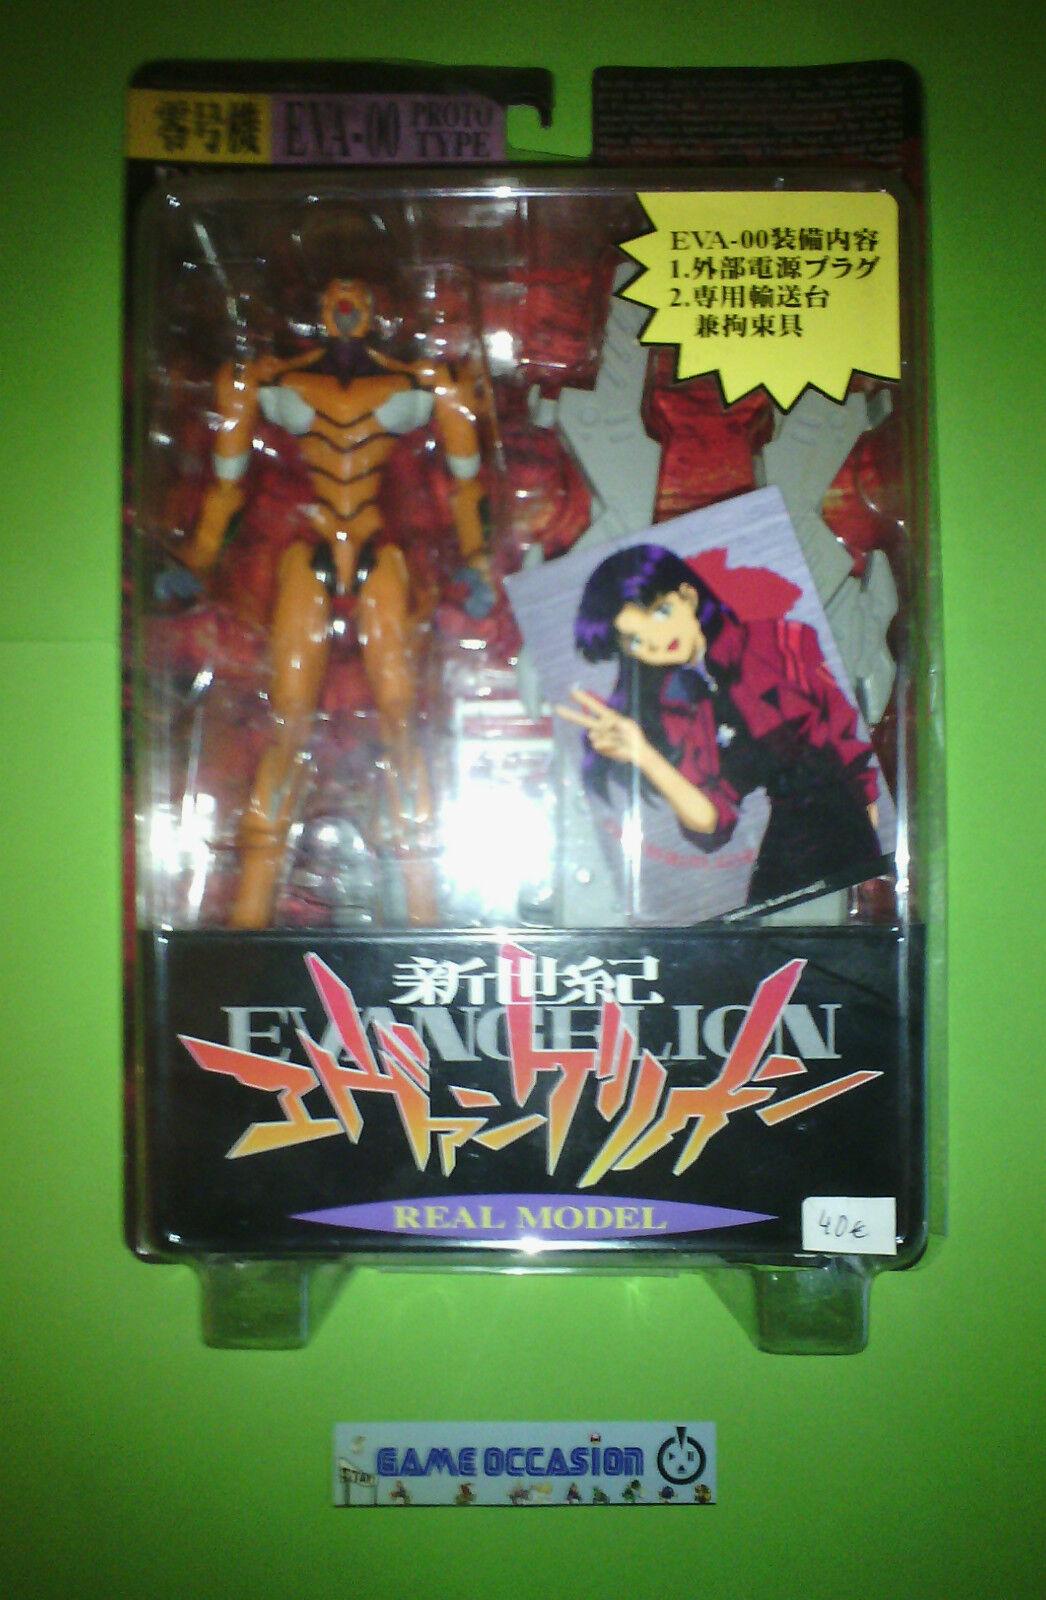 Personaggio Evangelion Neon Genesis Eva-00 Prossootipo Real modellololo 04 Sega Nas